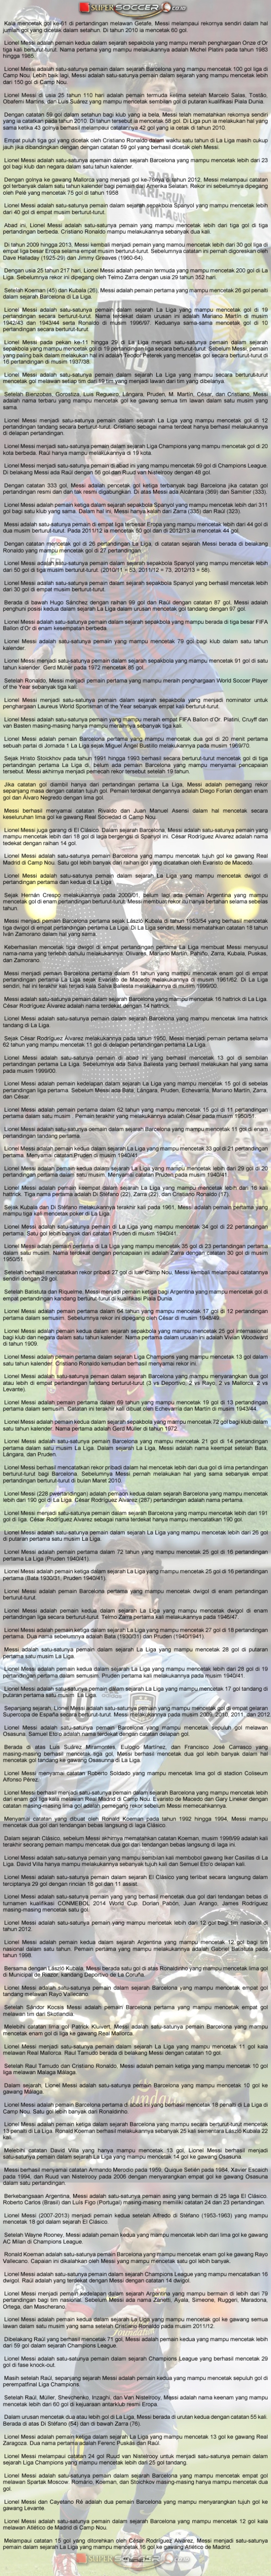 12-Lionel-Messi-_in